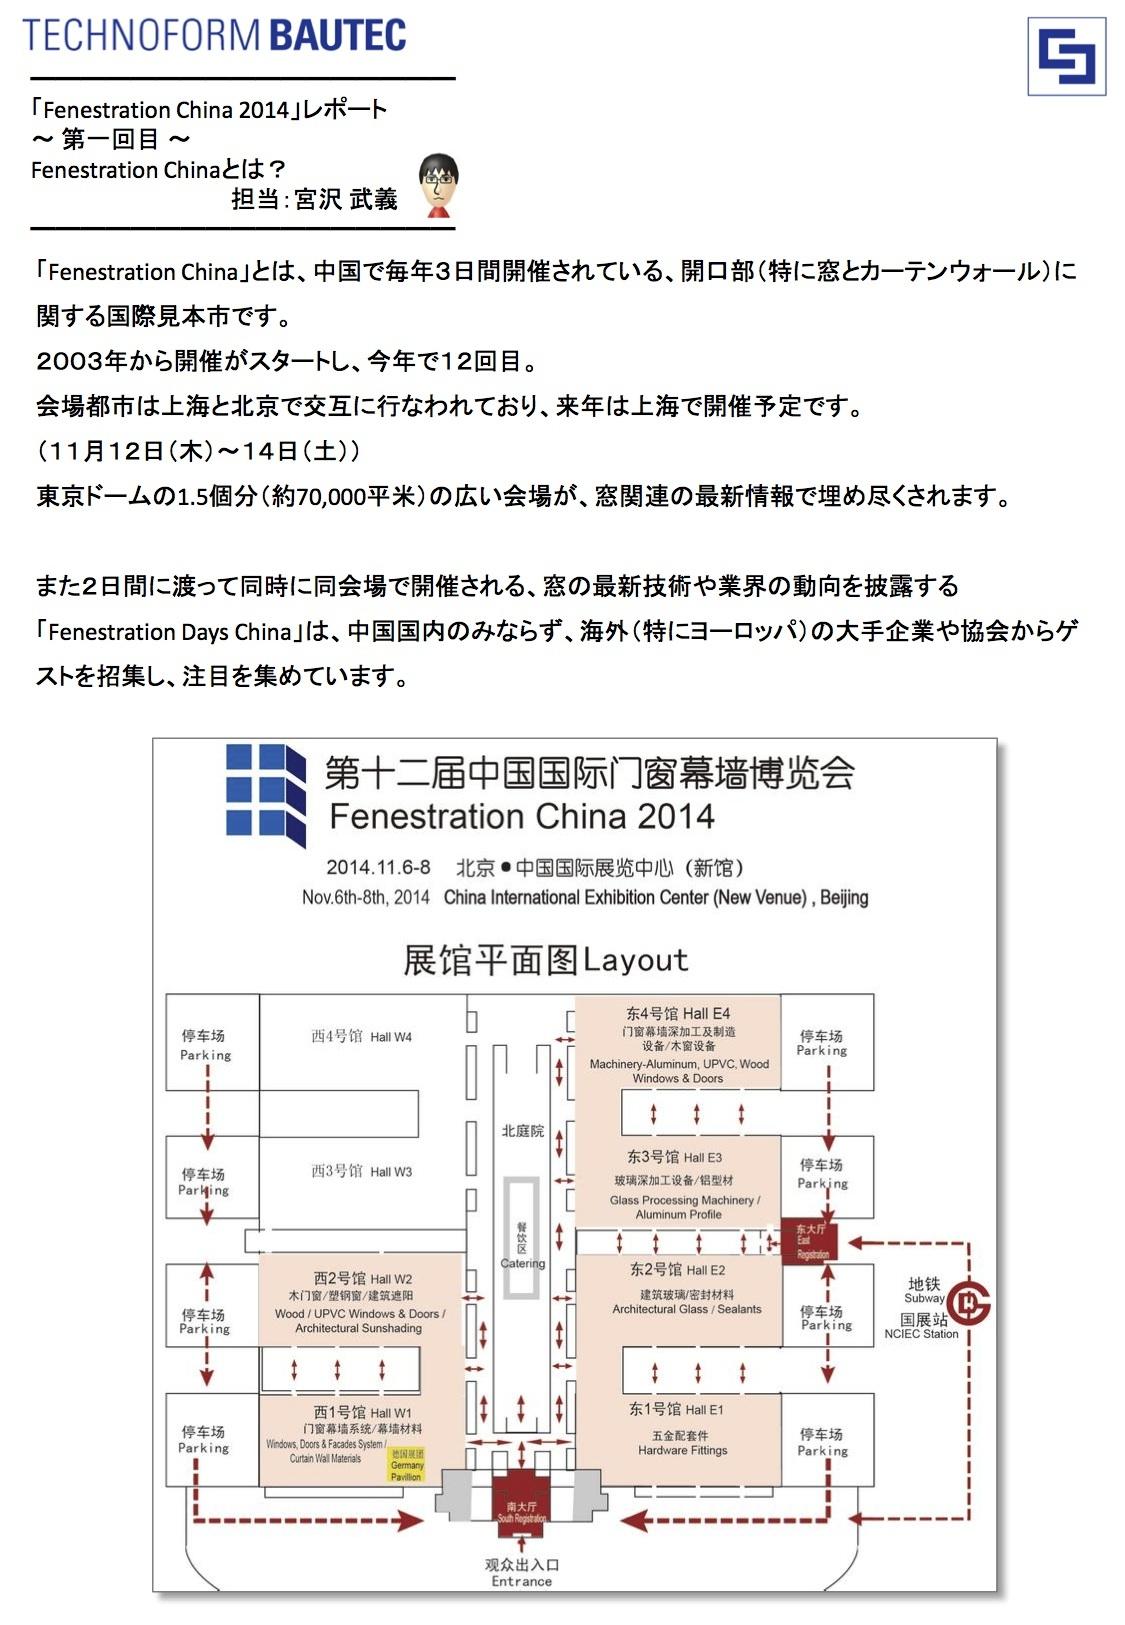 PWJ秋田 2:中国アルミサッシ樹脂ブリッジ_e0054299_17393084.jpg